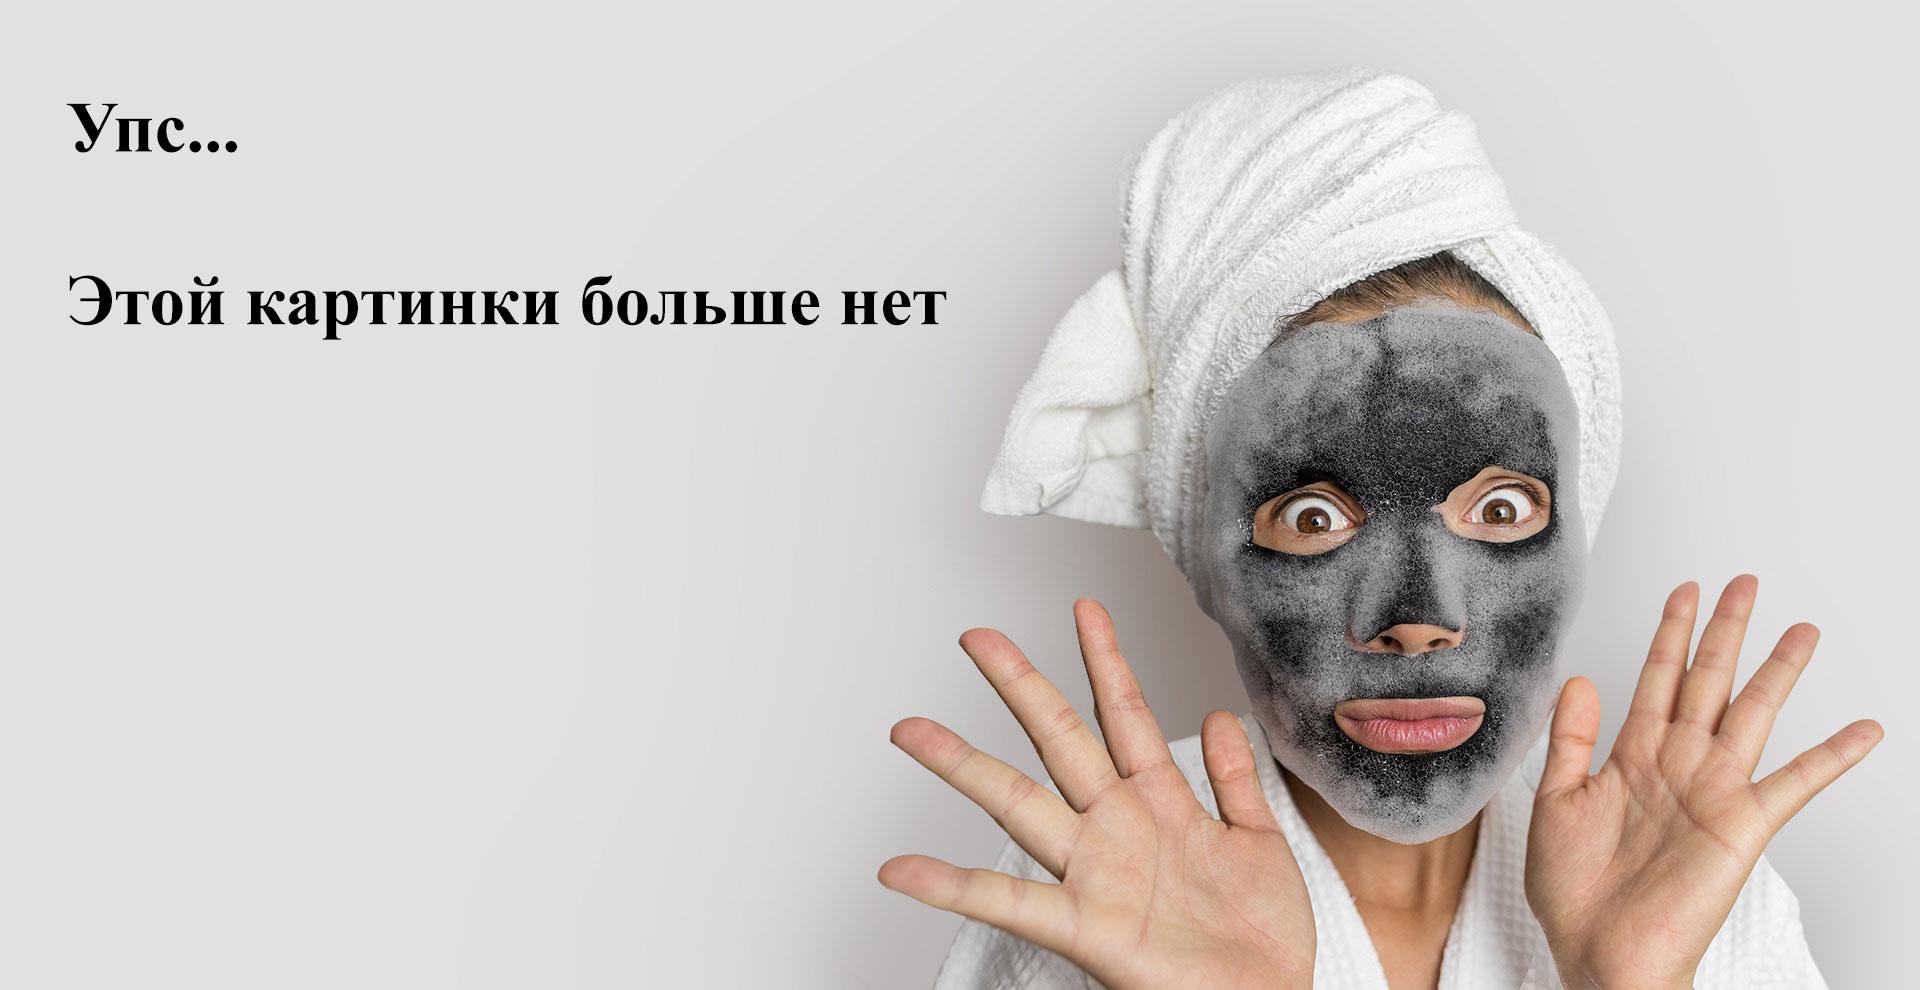 Patrisa Nail, Жидкость для мытья кисточек, 100 мл